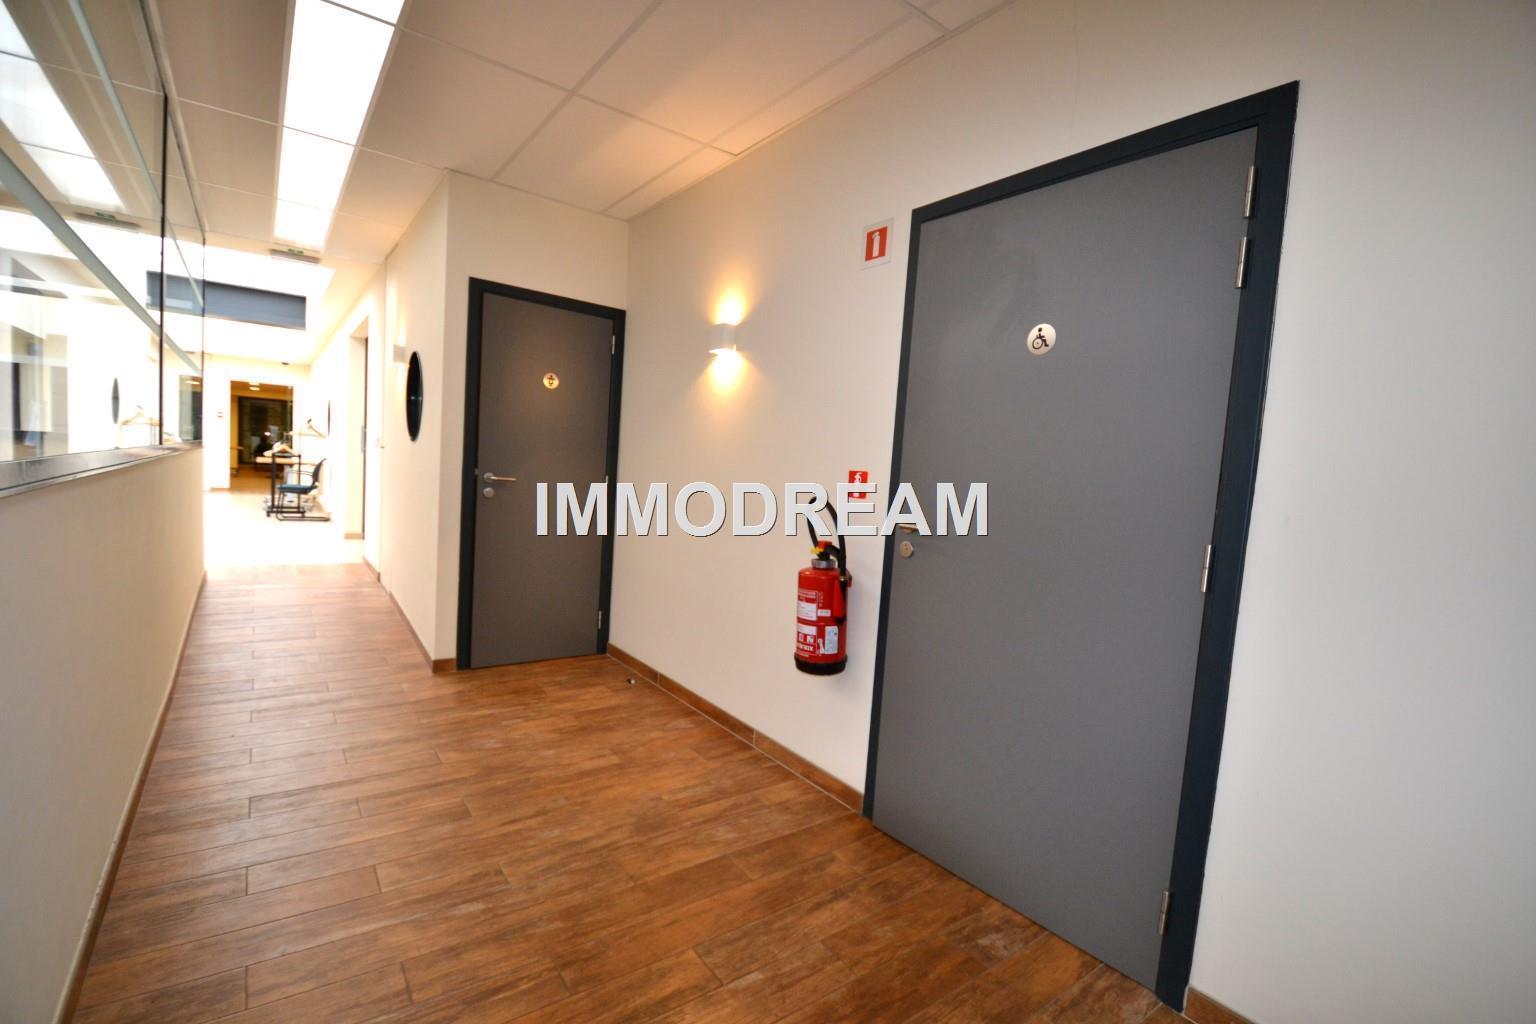 Mixt building off + res. - Woluwe-Saint-Lambert - #4025861-9